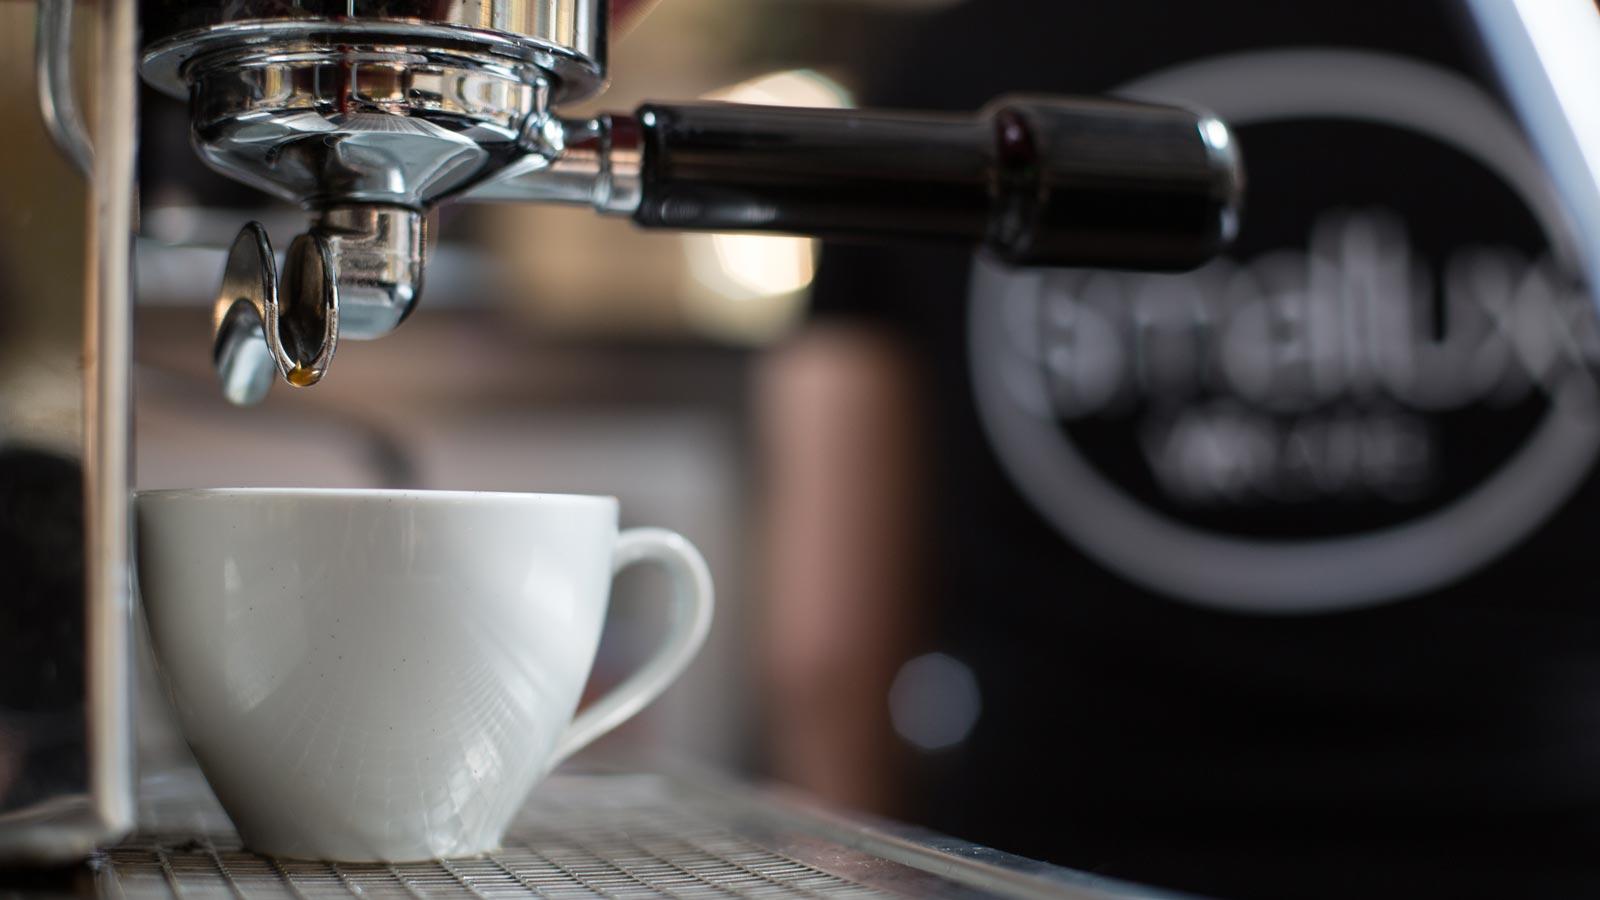 Smallux VR Cafe Gurme Kahve